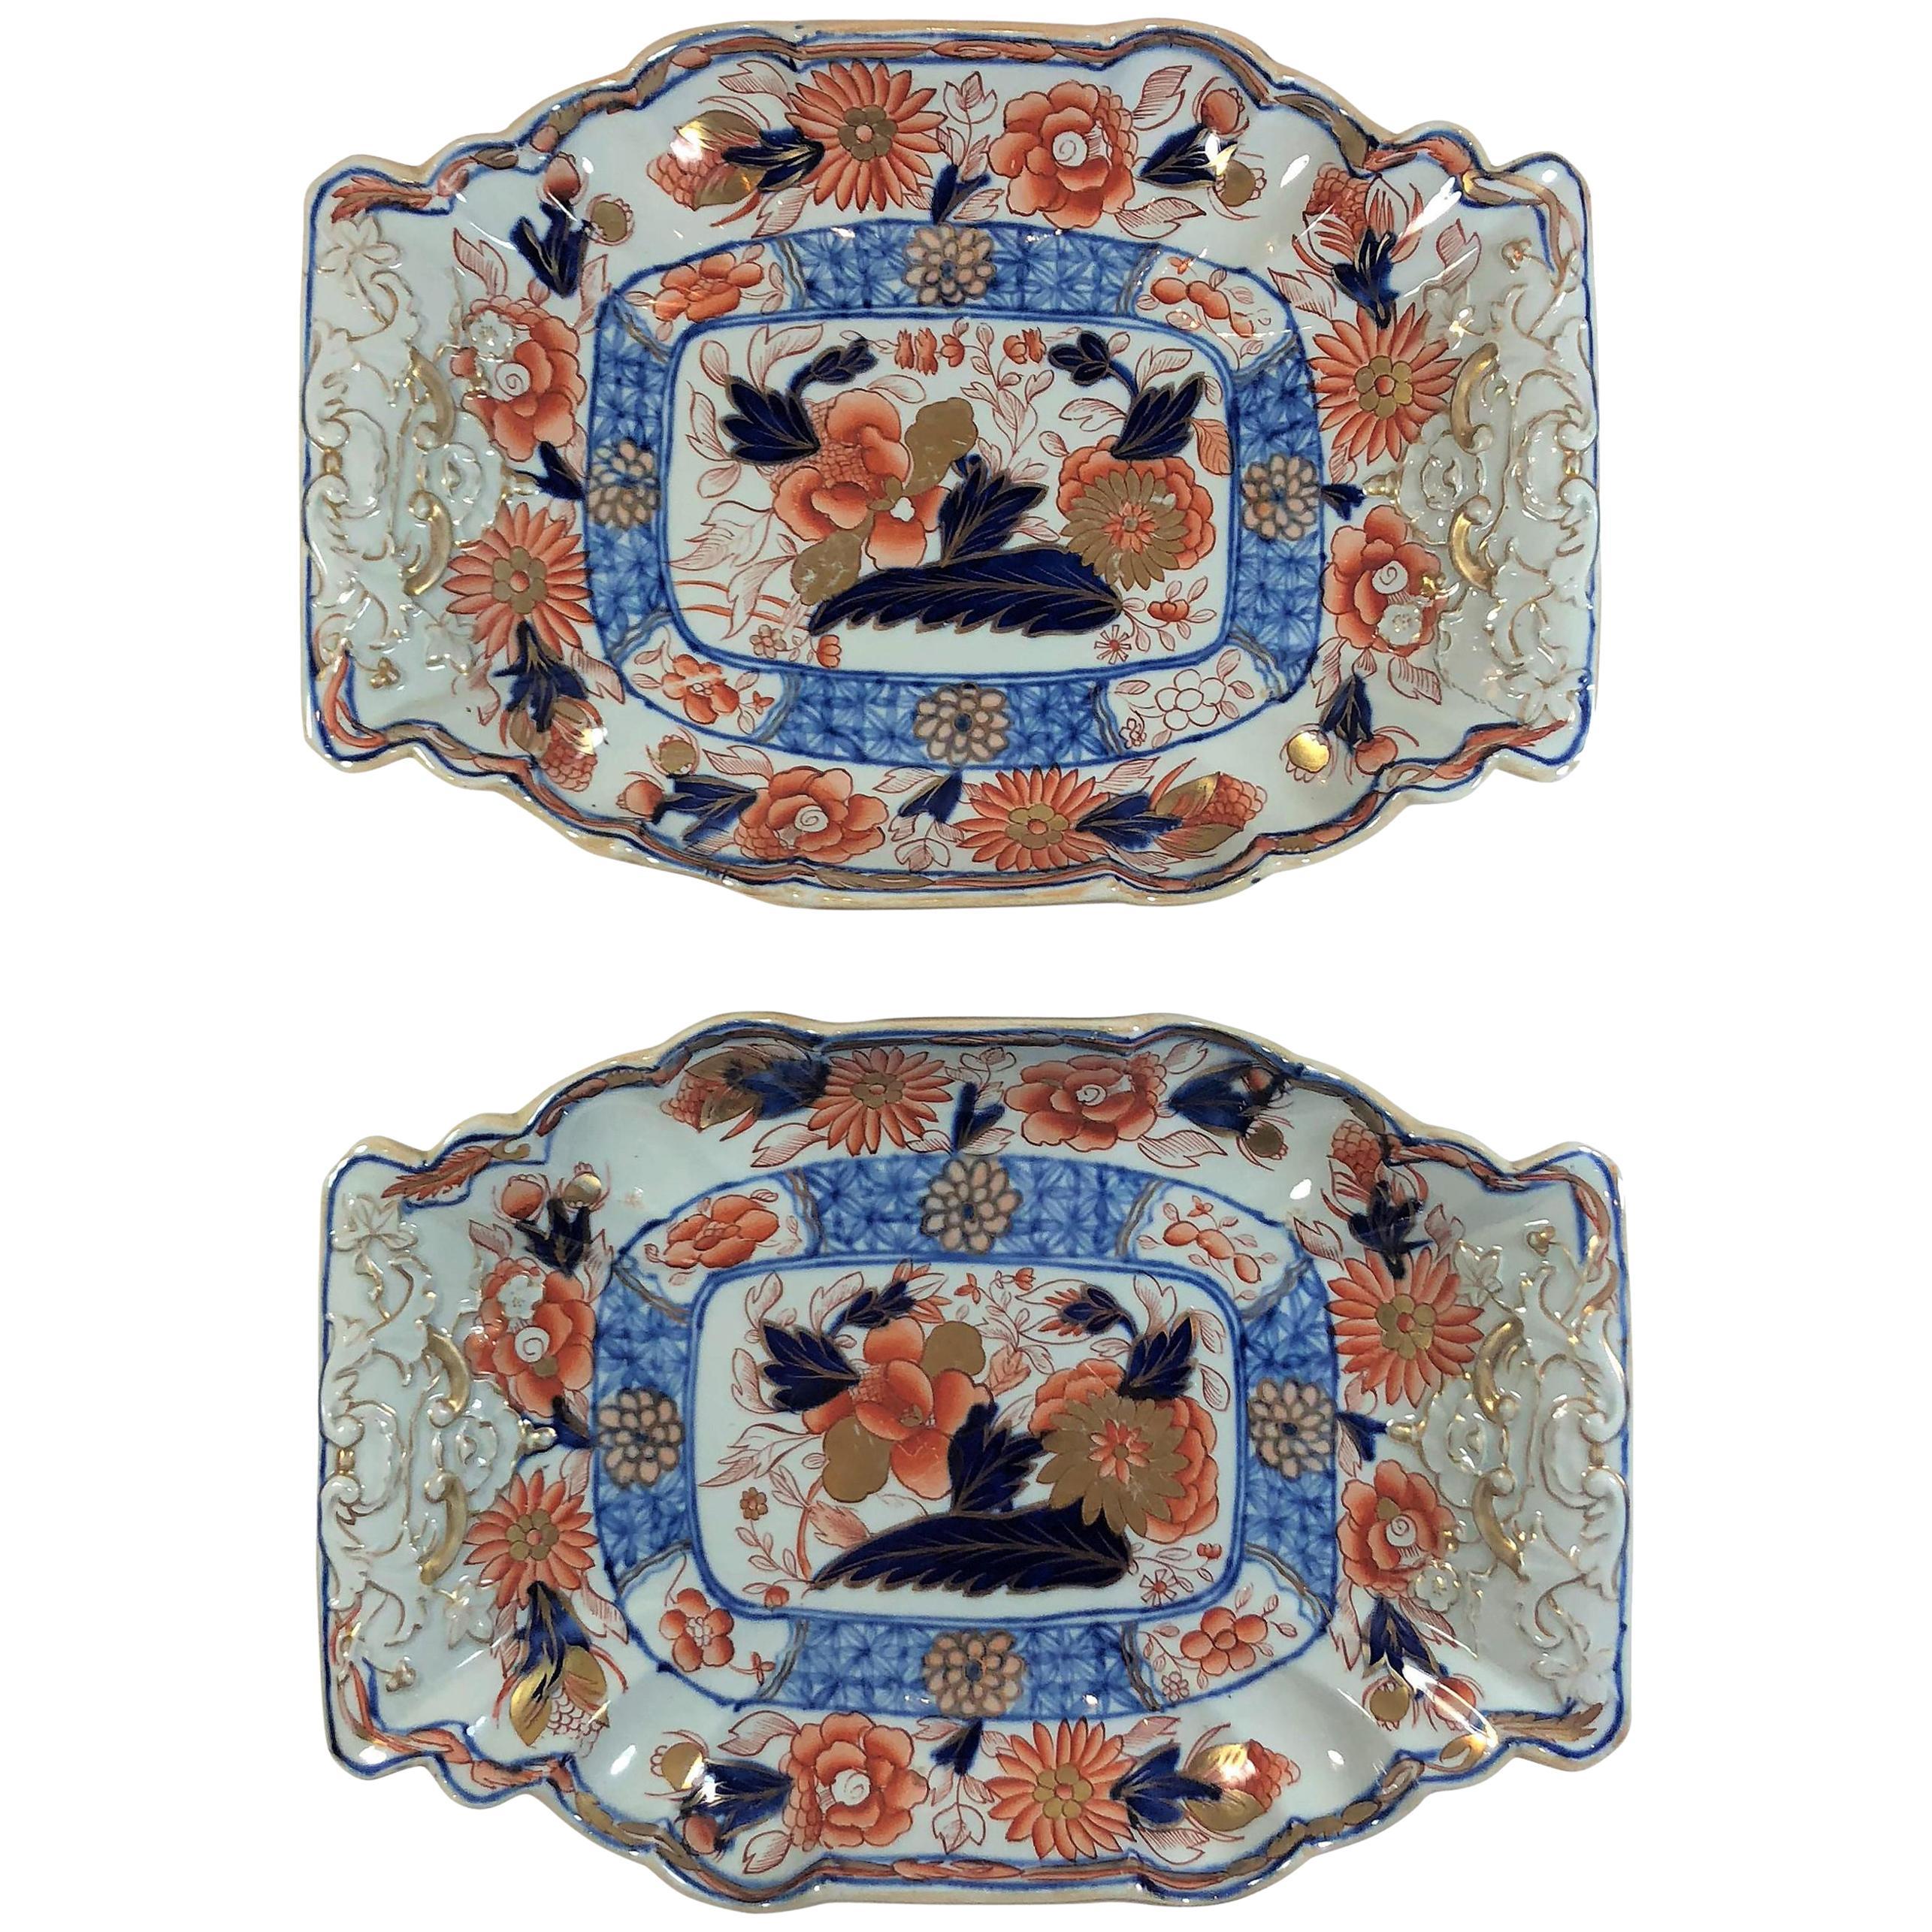 Pair of Antique English Mason's Ironstone Platters